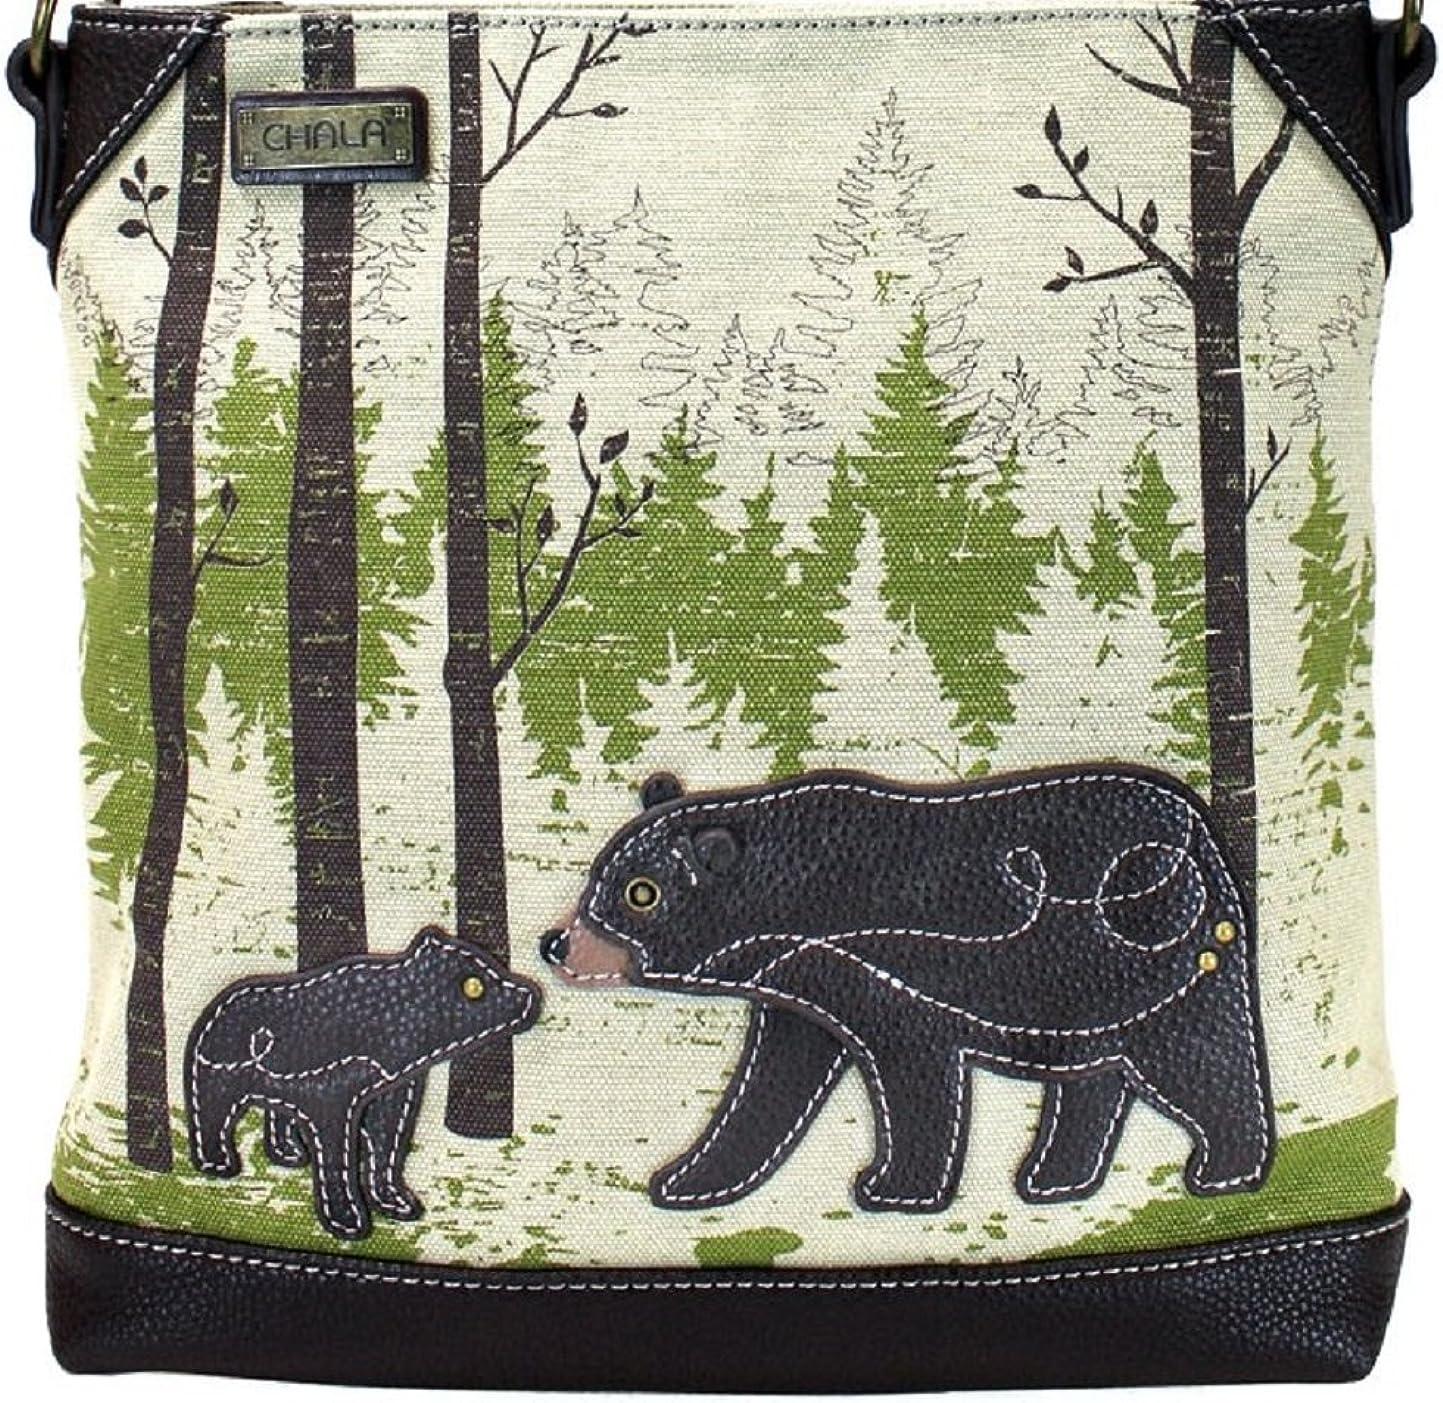 Chala Handbag Large discharge sale Safari Canvas Messenger Bag Regular discount Crossbody Mid-Size